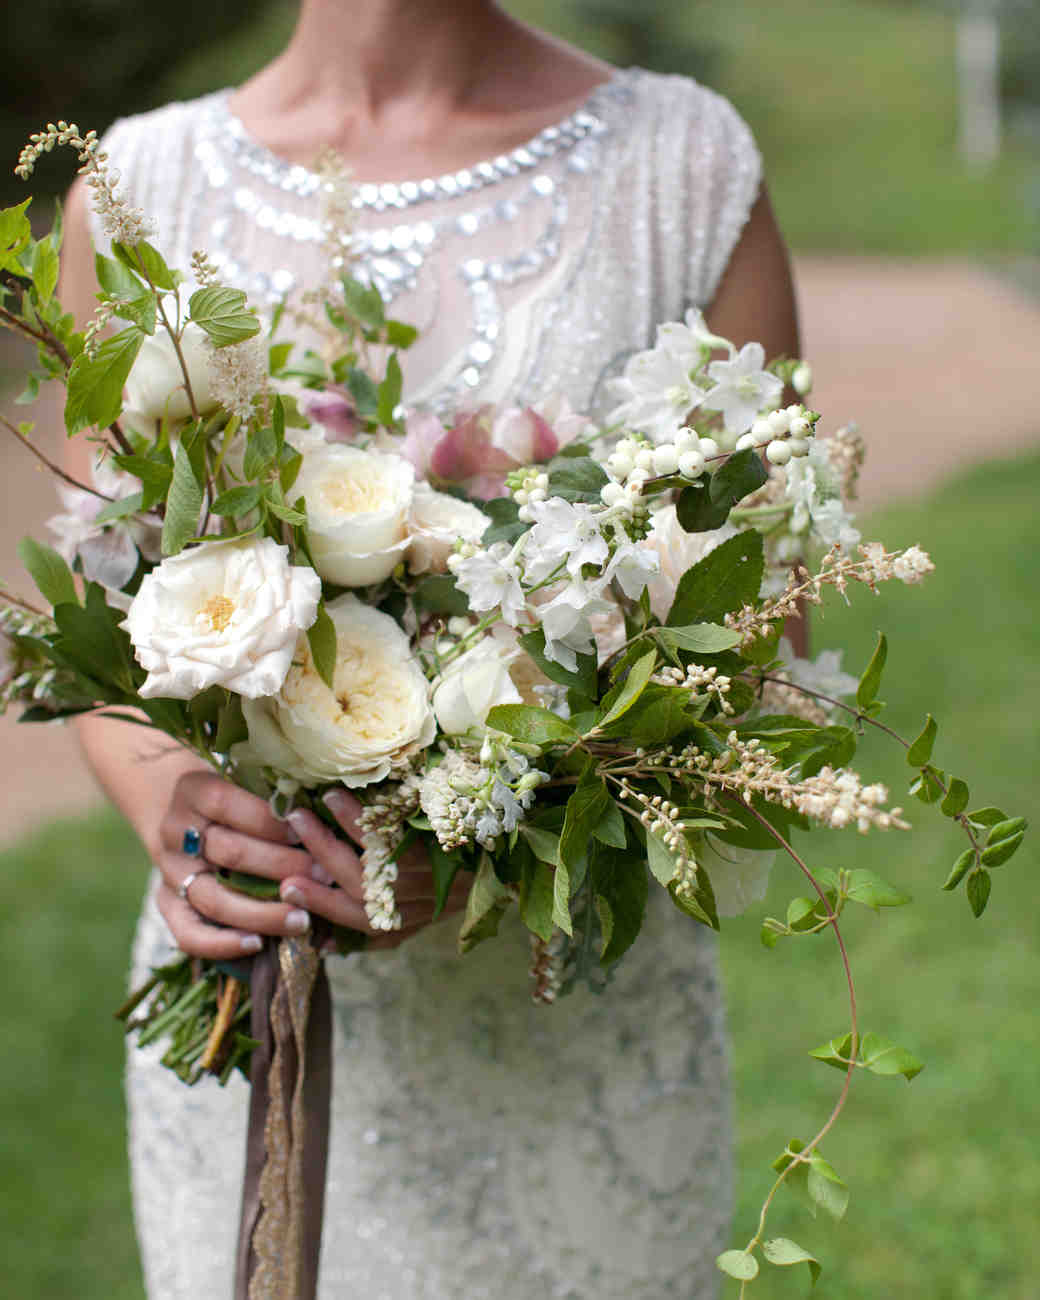 lizzy-pat-wedding-bouquet-051-s111777-0115.jpg